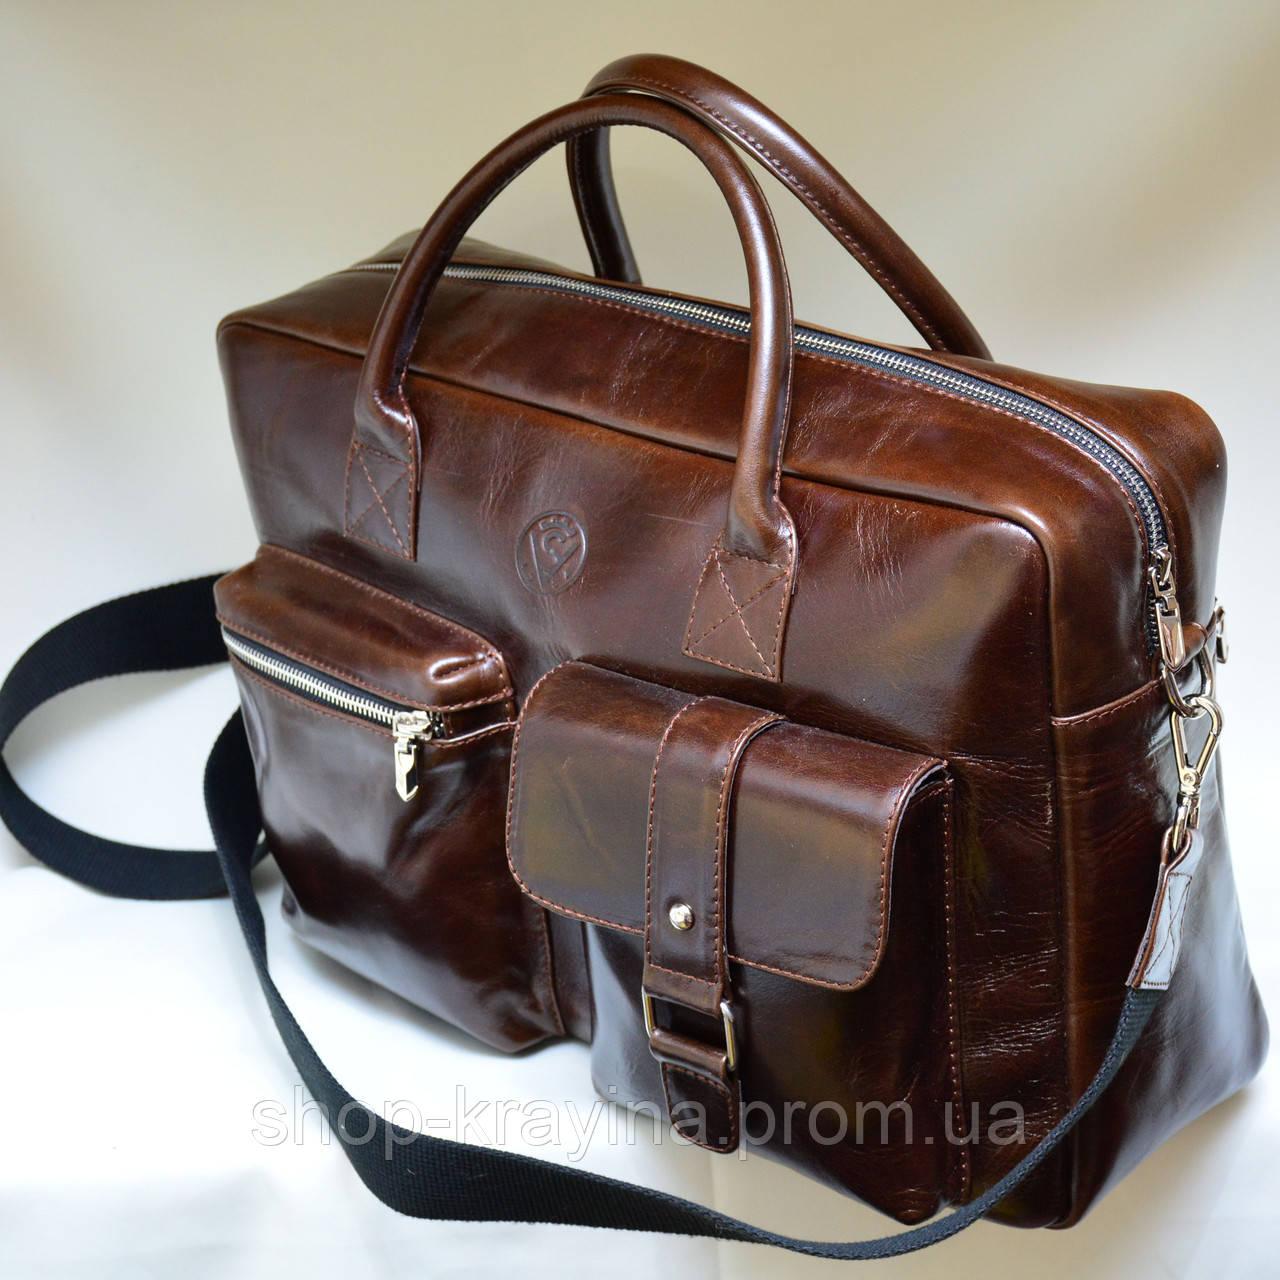 Кожаная сумка VS75  vintage 40х26х10 см